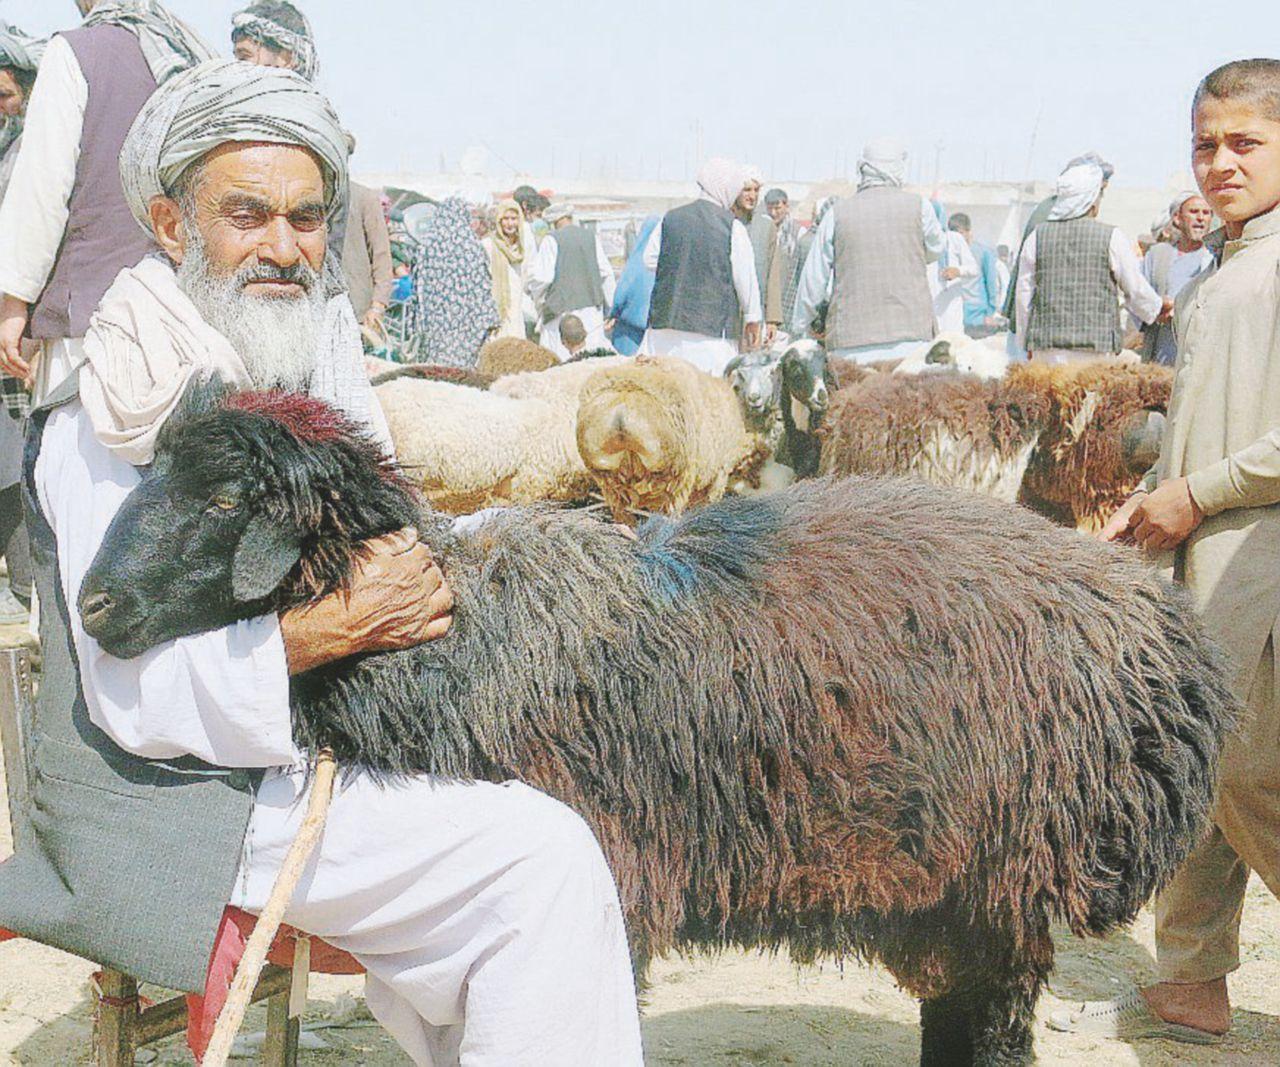 Afghanistan, 9 capre da 6 milioni di dollari e altri sprechi Usa